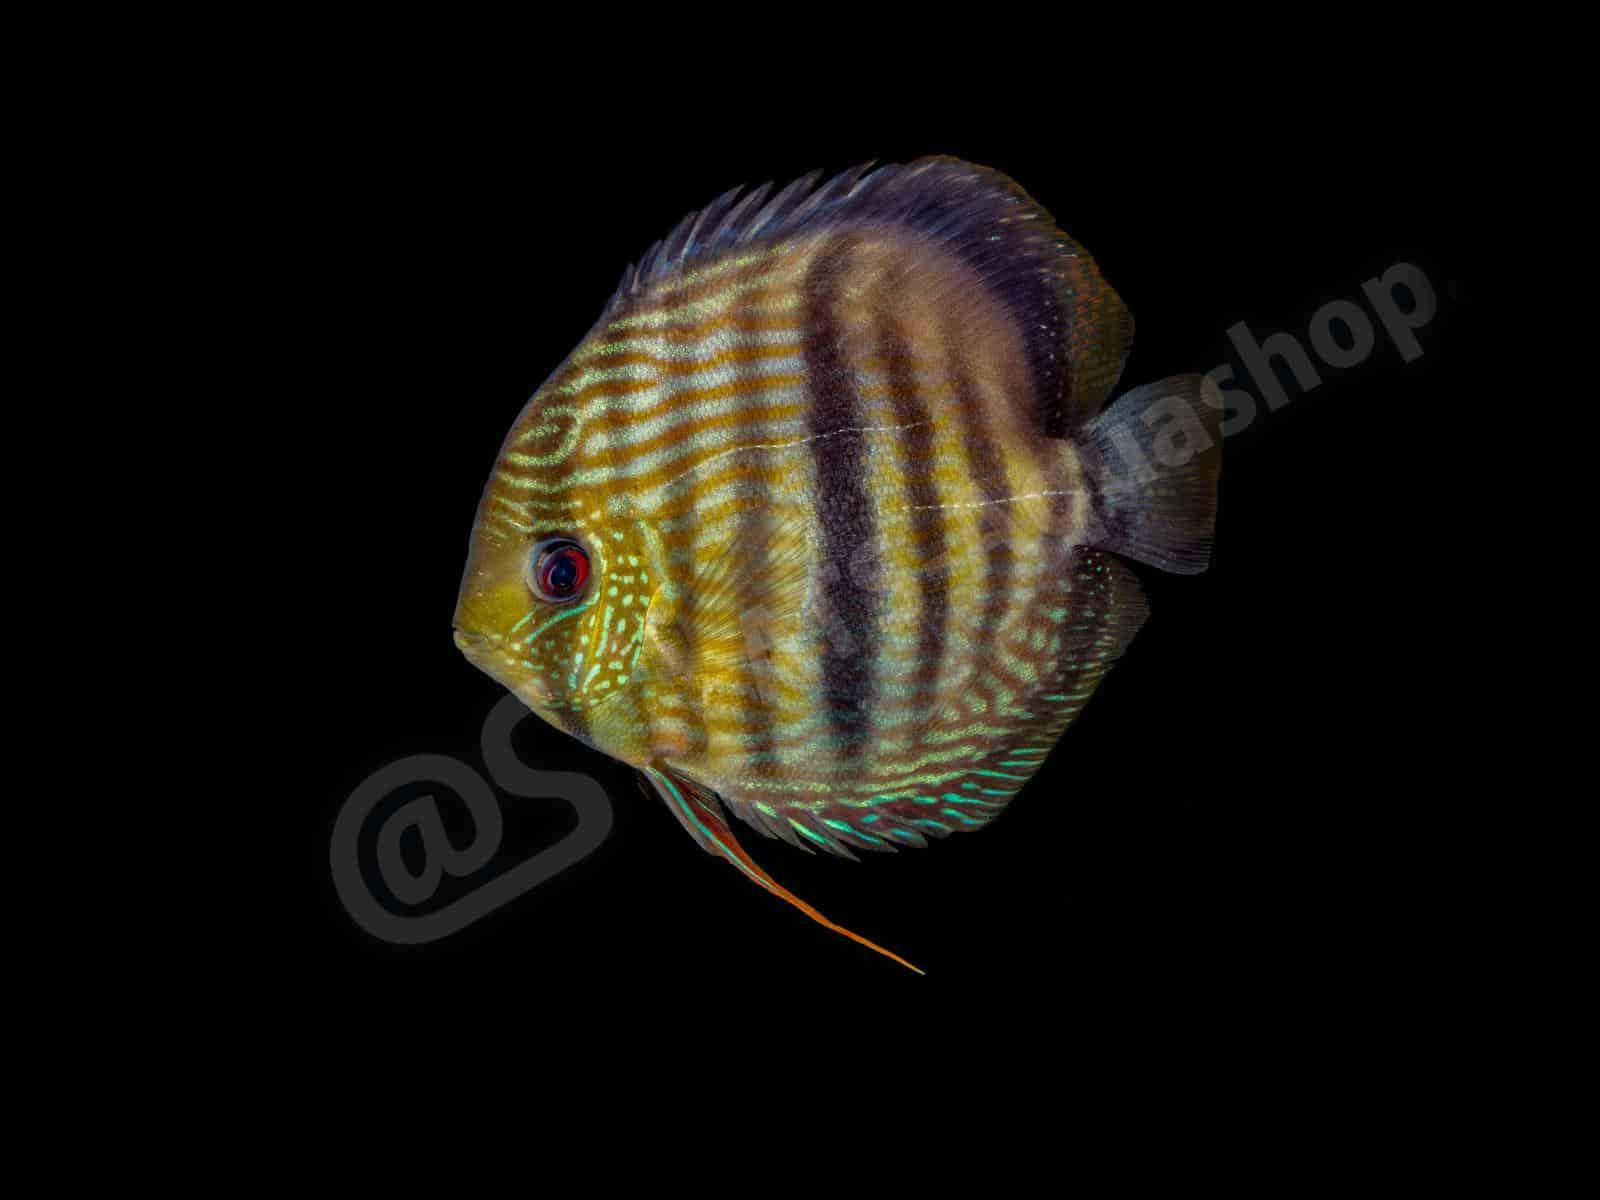 symphysodon diskus  nhamunda  andreas tanke 0095 6